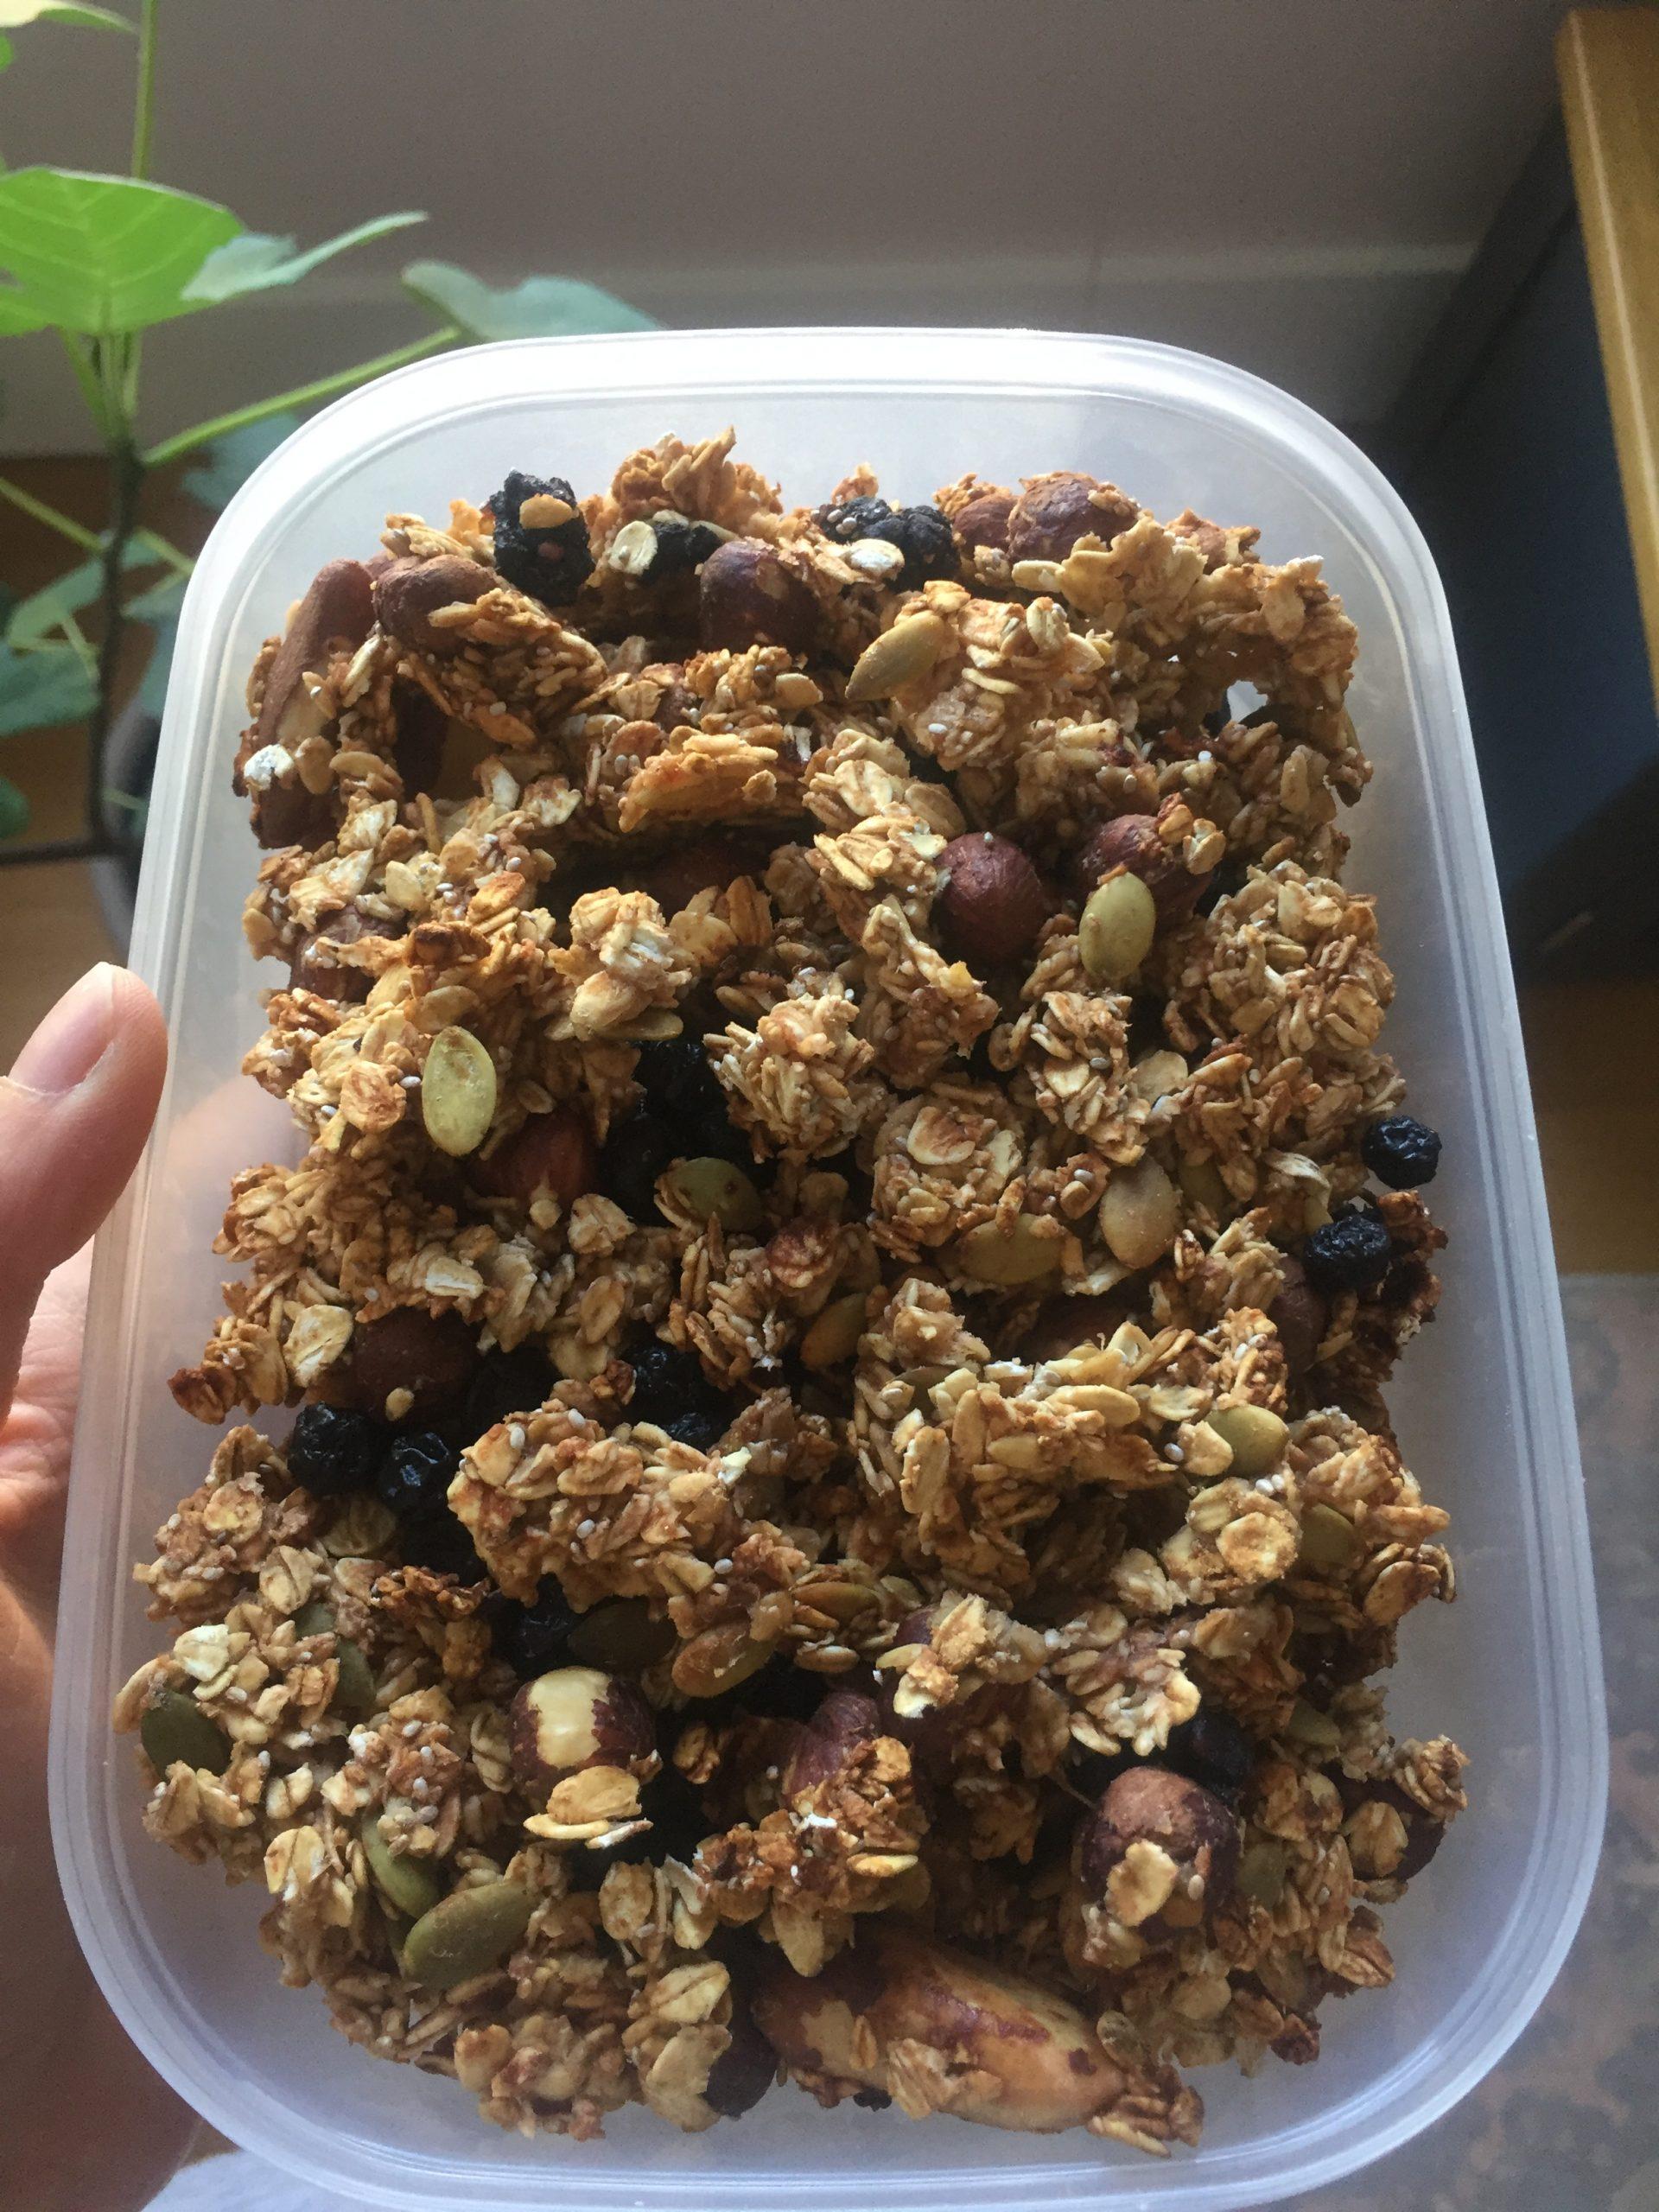 Box of homemade granola